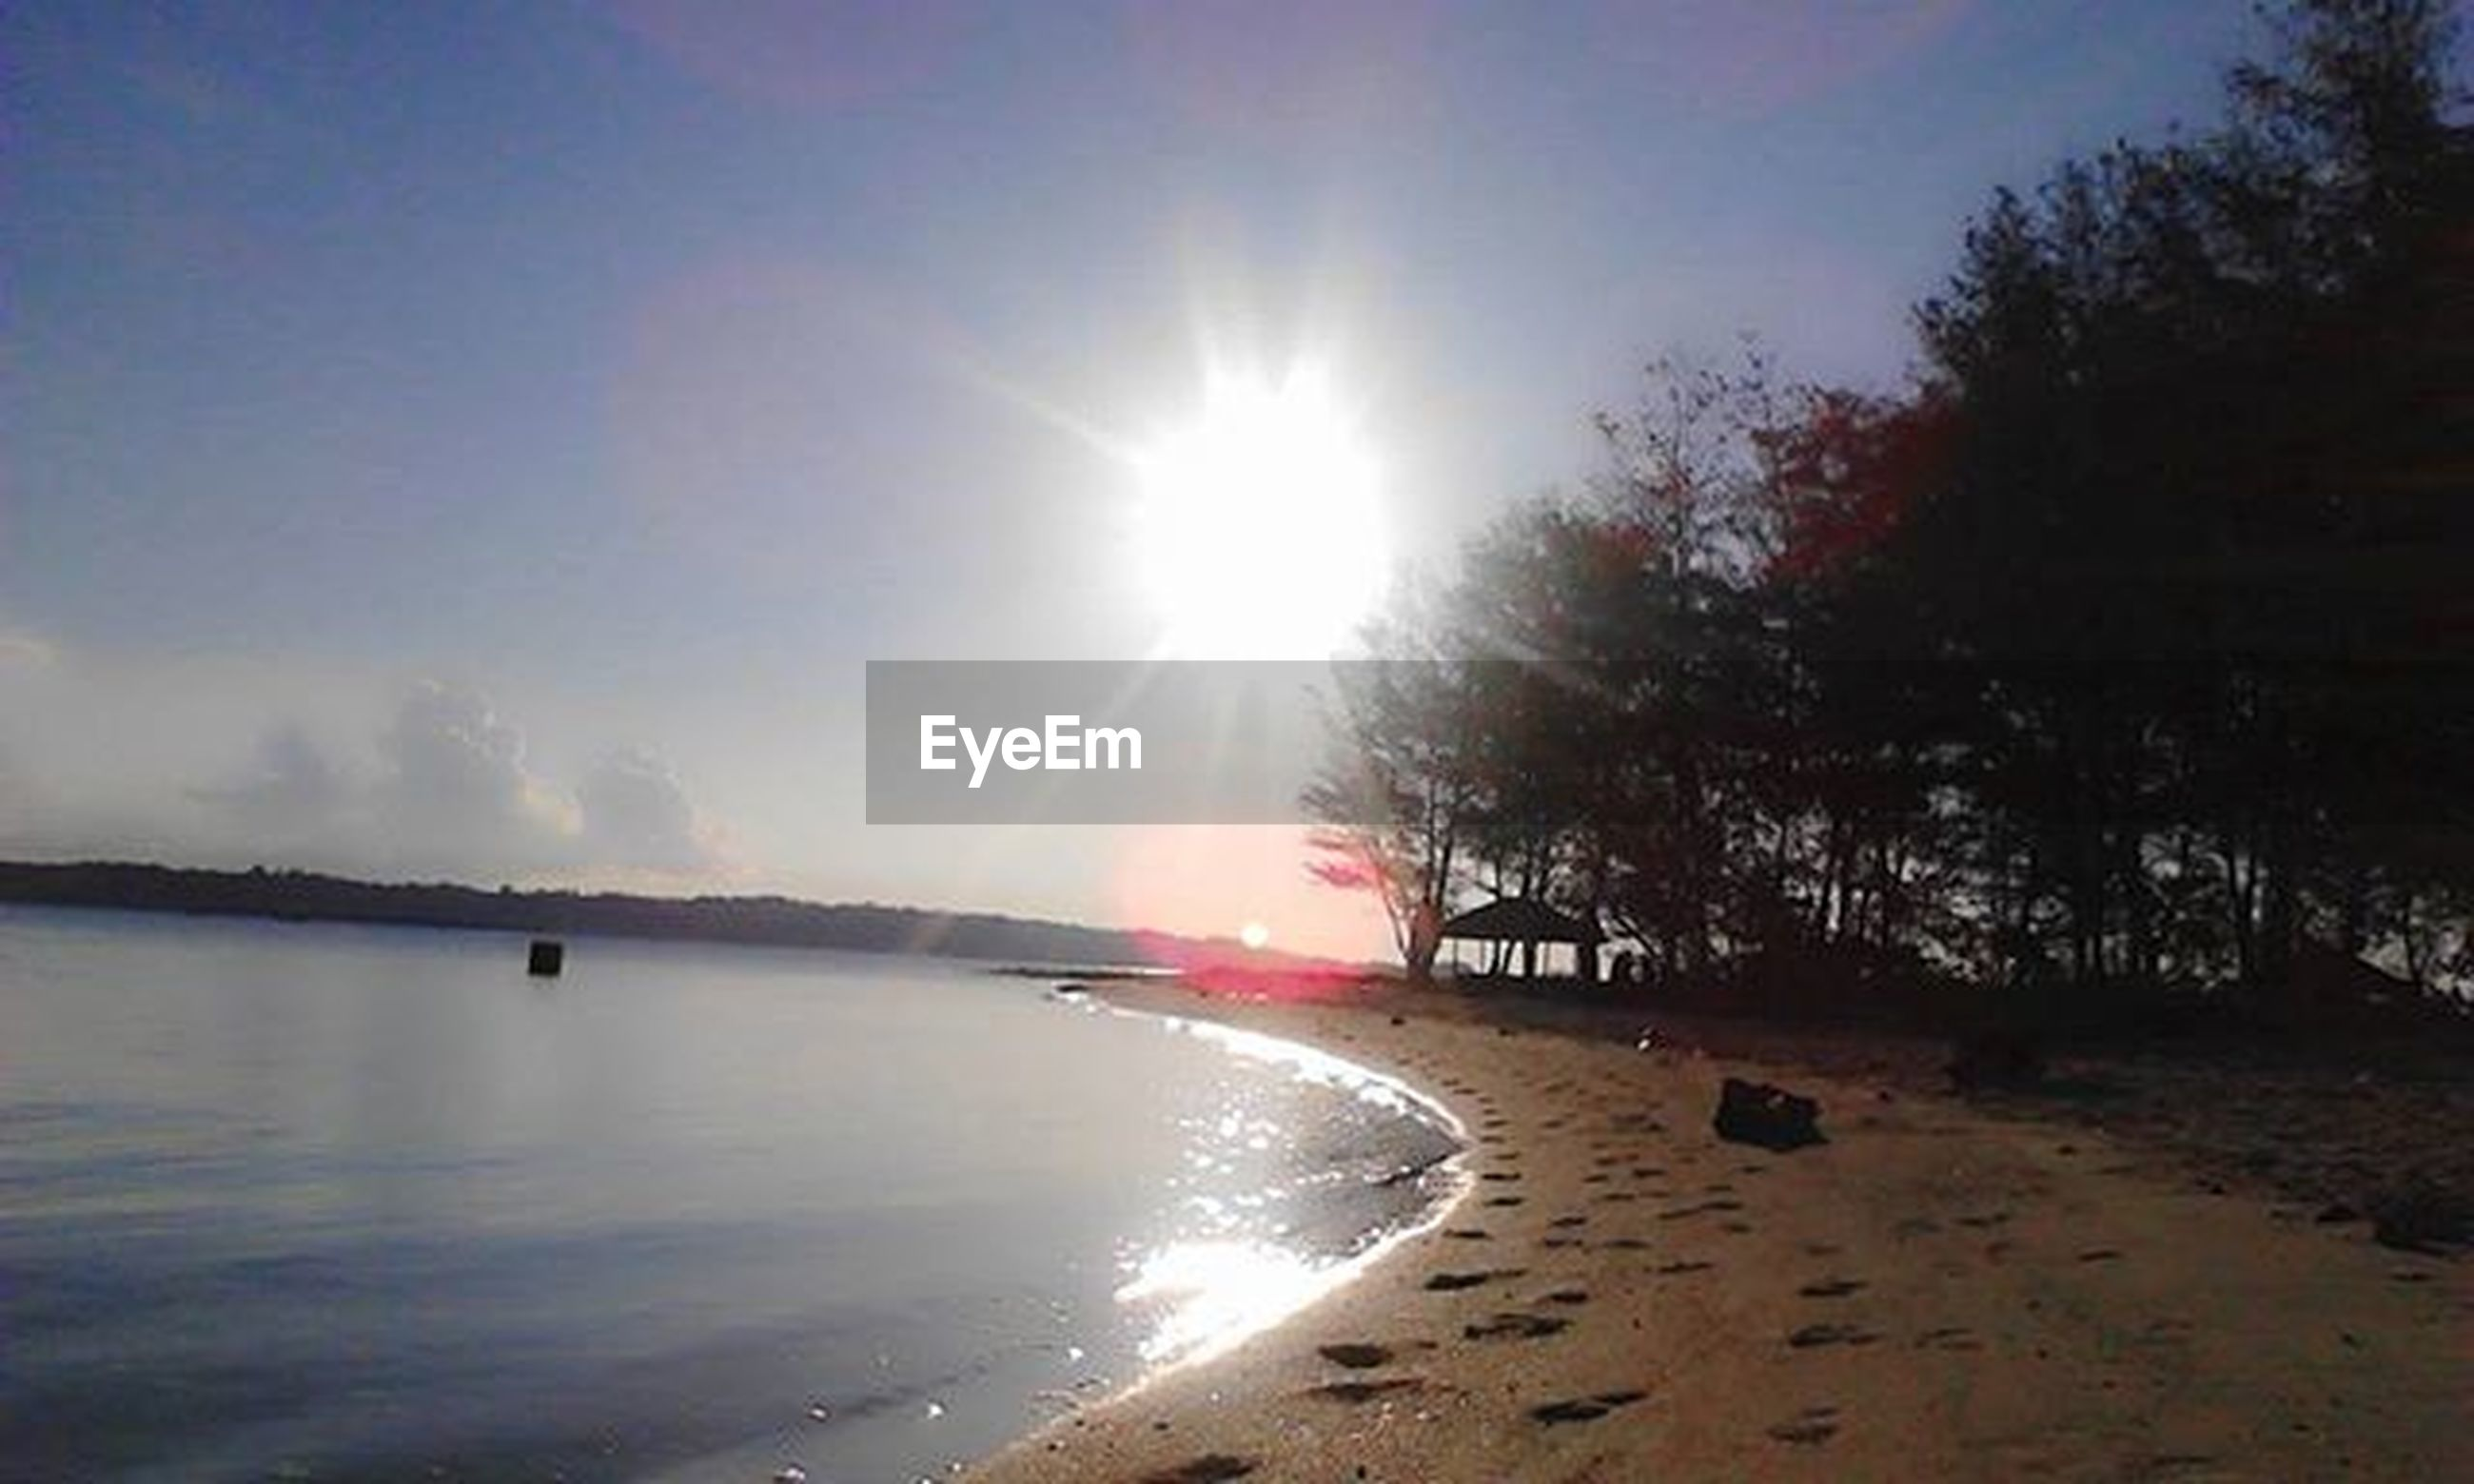 sun, sunlight, sunbeam, tree, water, tranquility, tranquil scene, lens flare, sky, scenics, beauty in nature, nature, sunny, beach, reflection, idyllic, river, outdoors, lake, non-urban scene